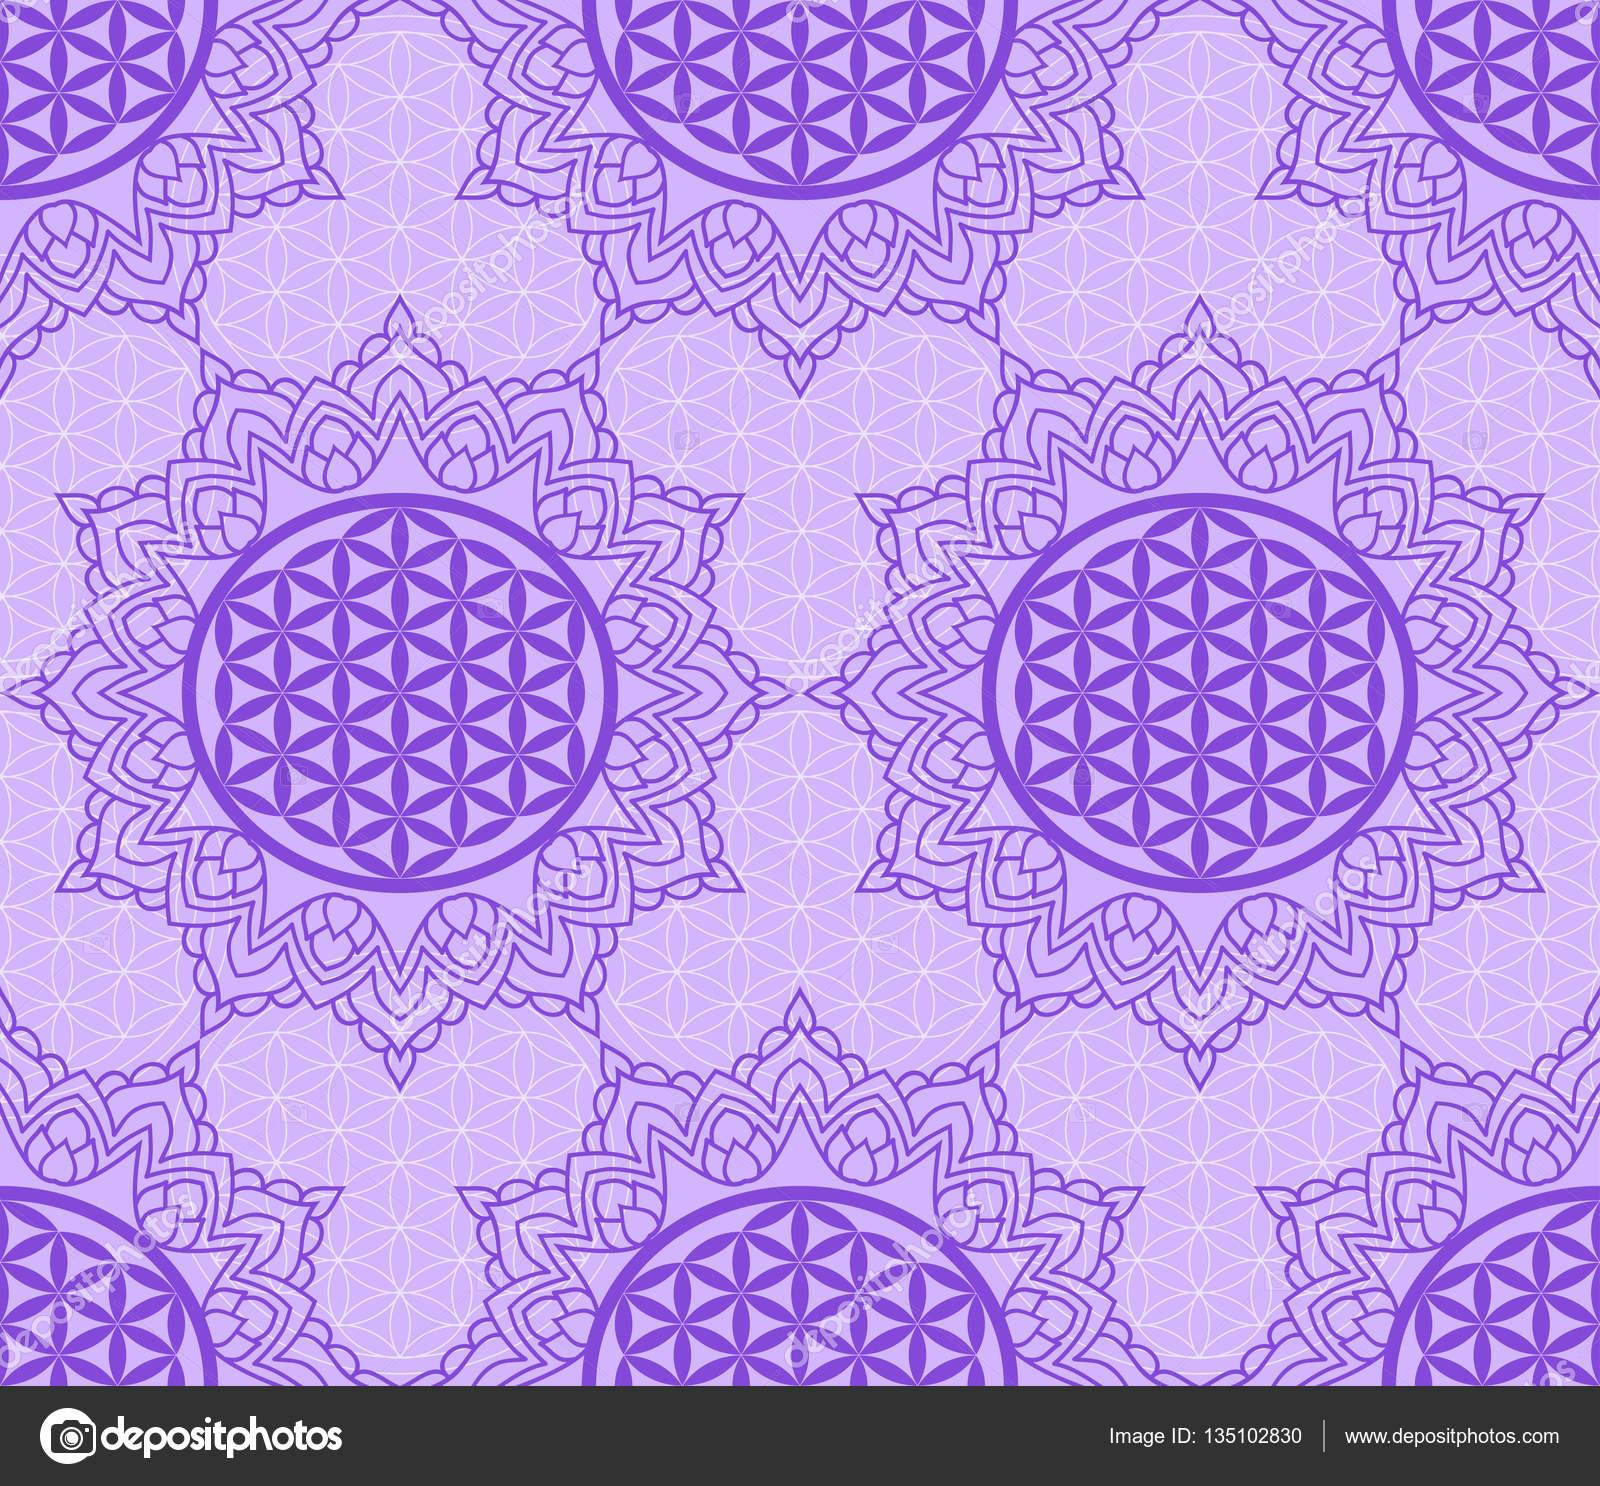 Mandala Flor De La Vida Patrón Sin Fisuras Con Un Símbolo Púrpura